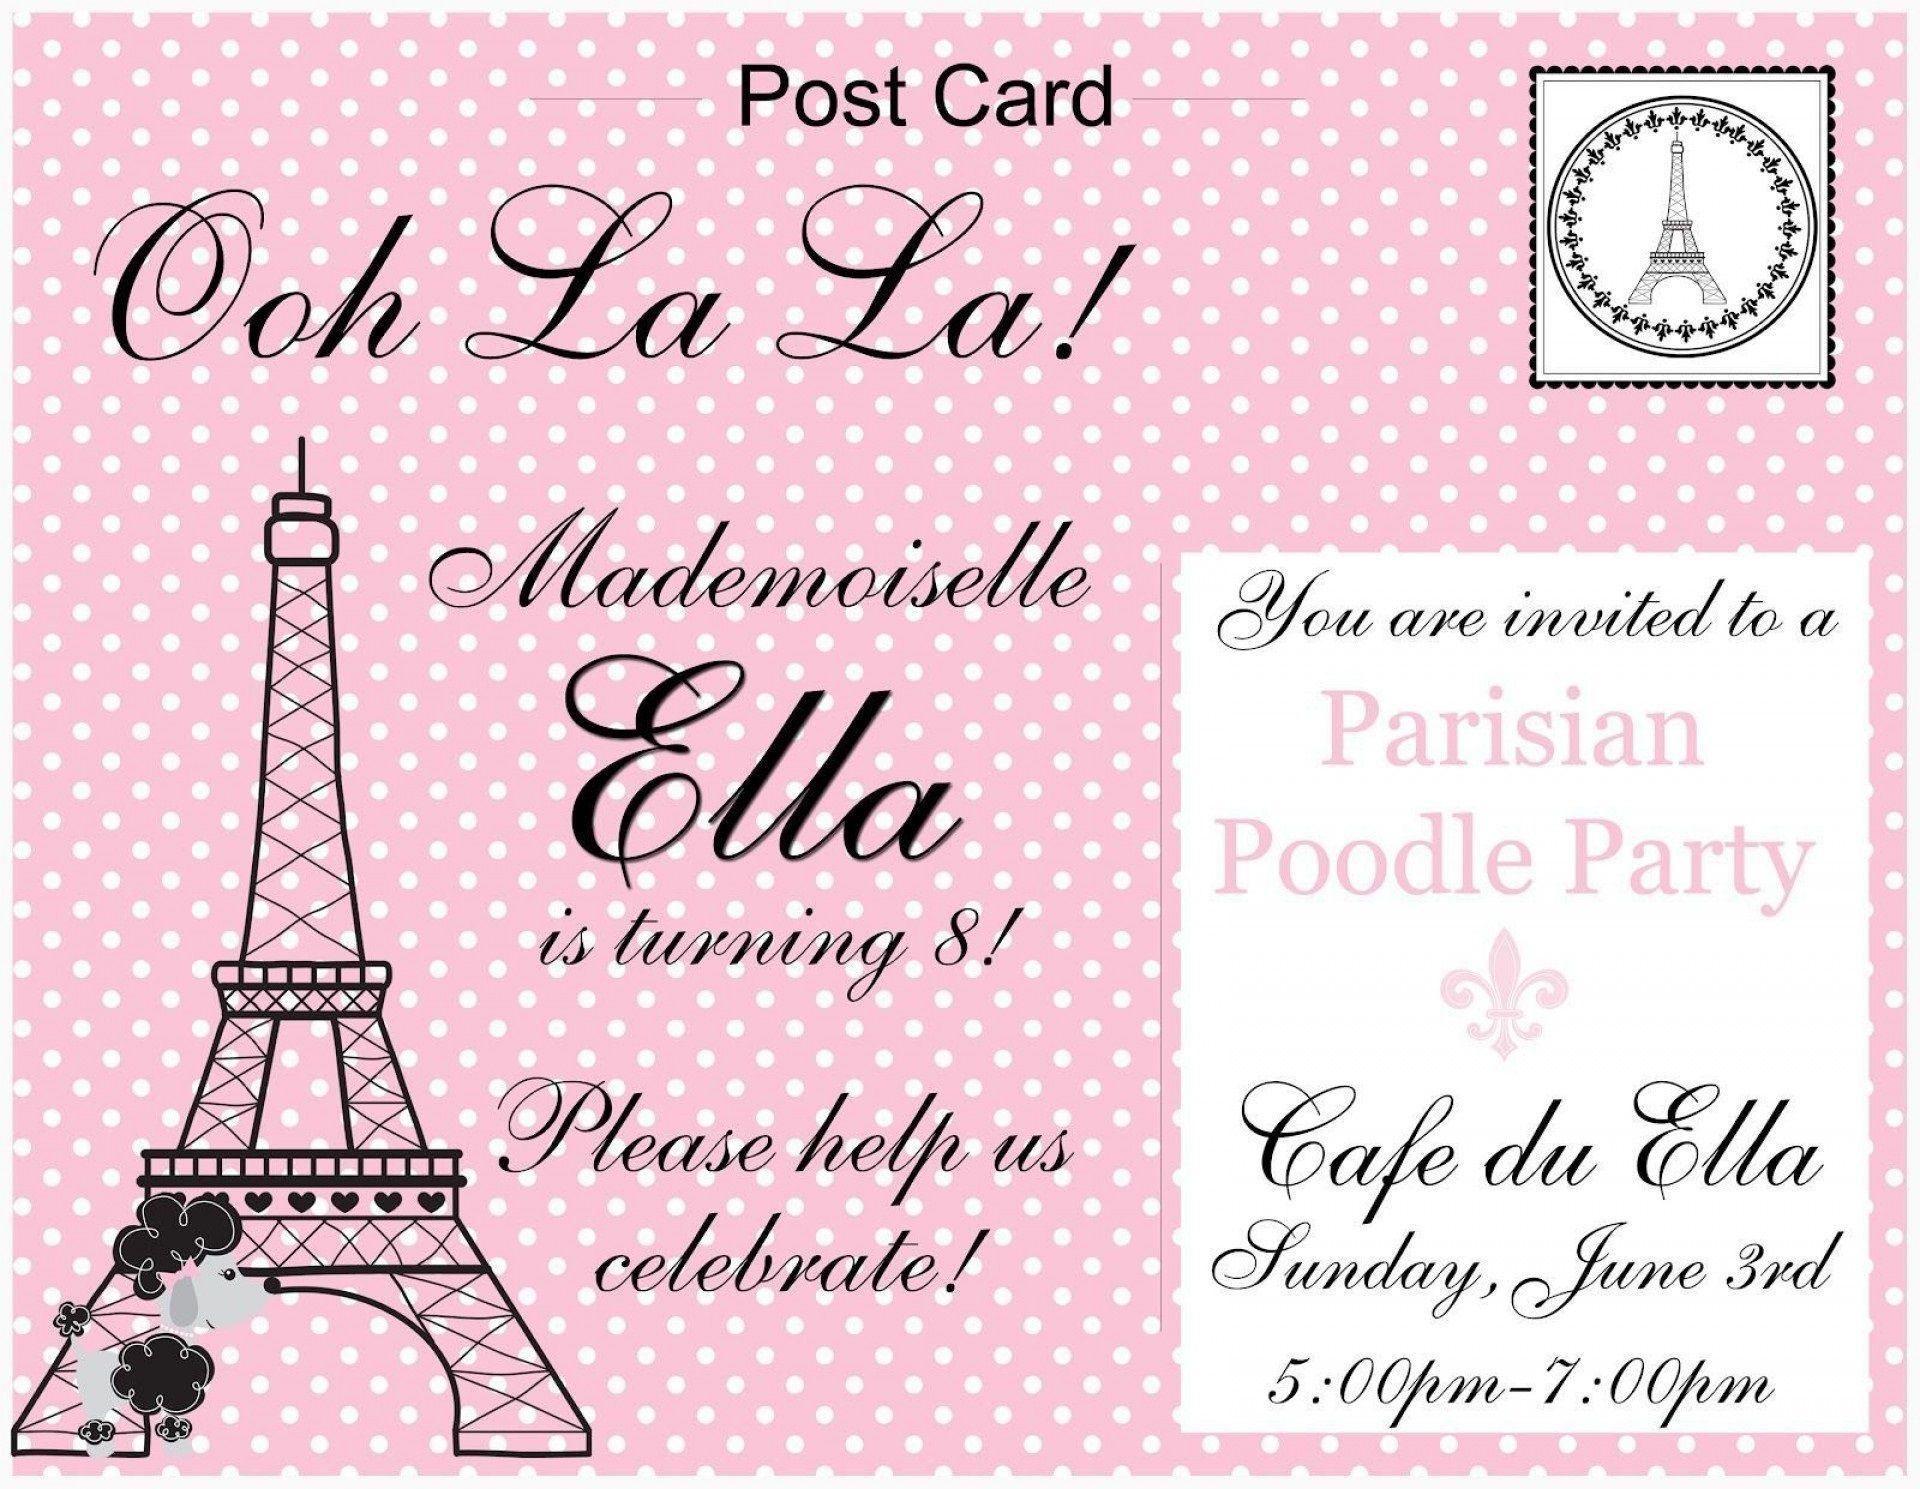 009 Beautiful Pari Birthday Invitation Template Free Picture Full